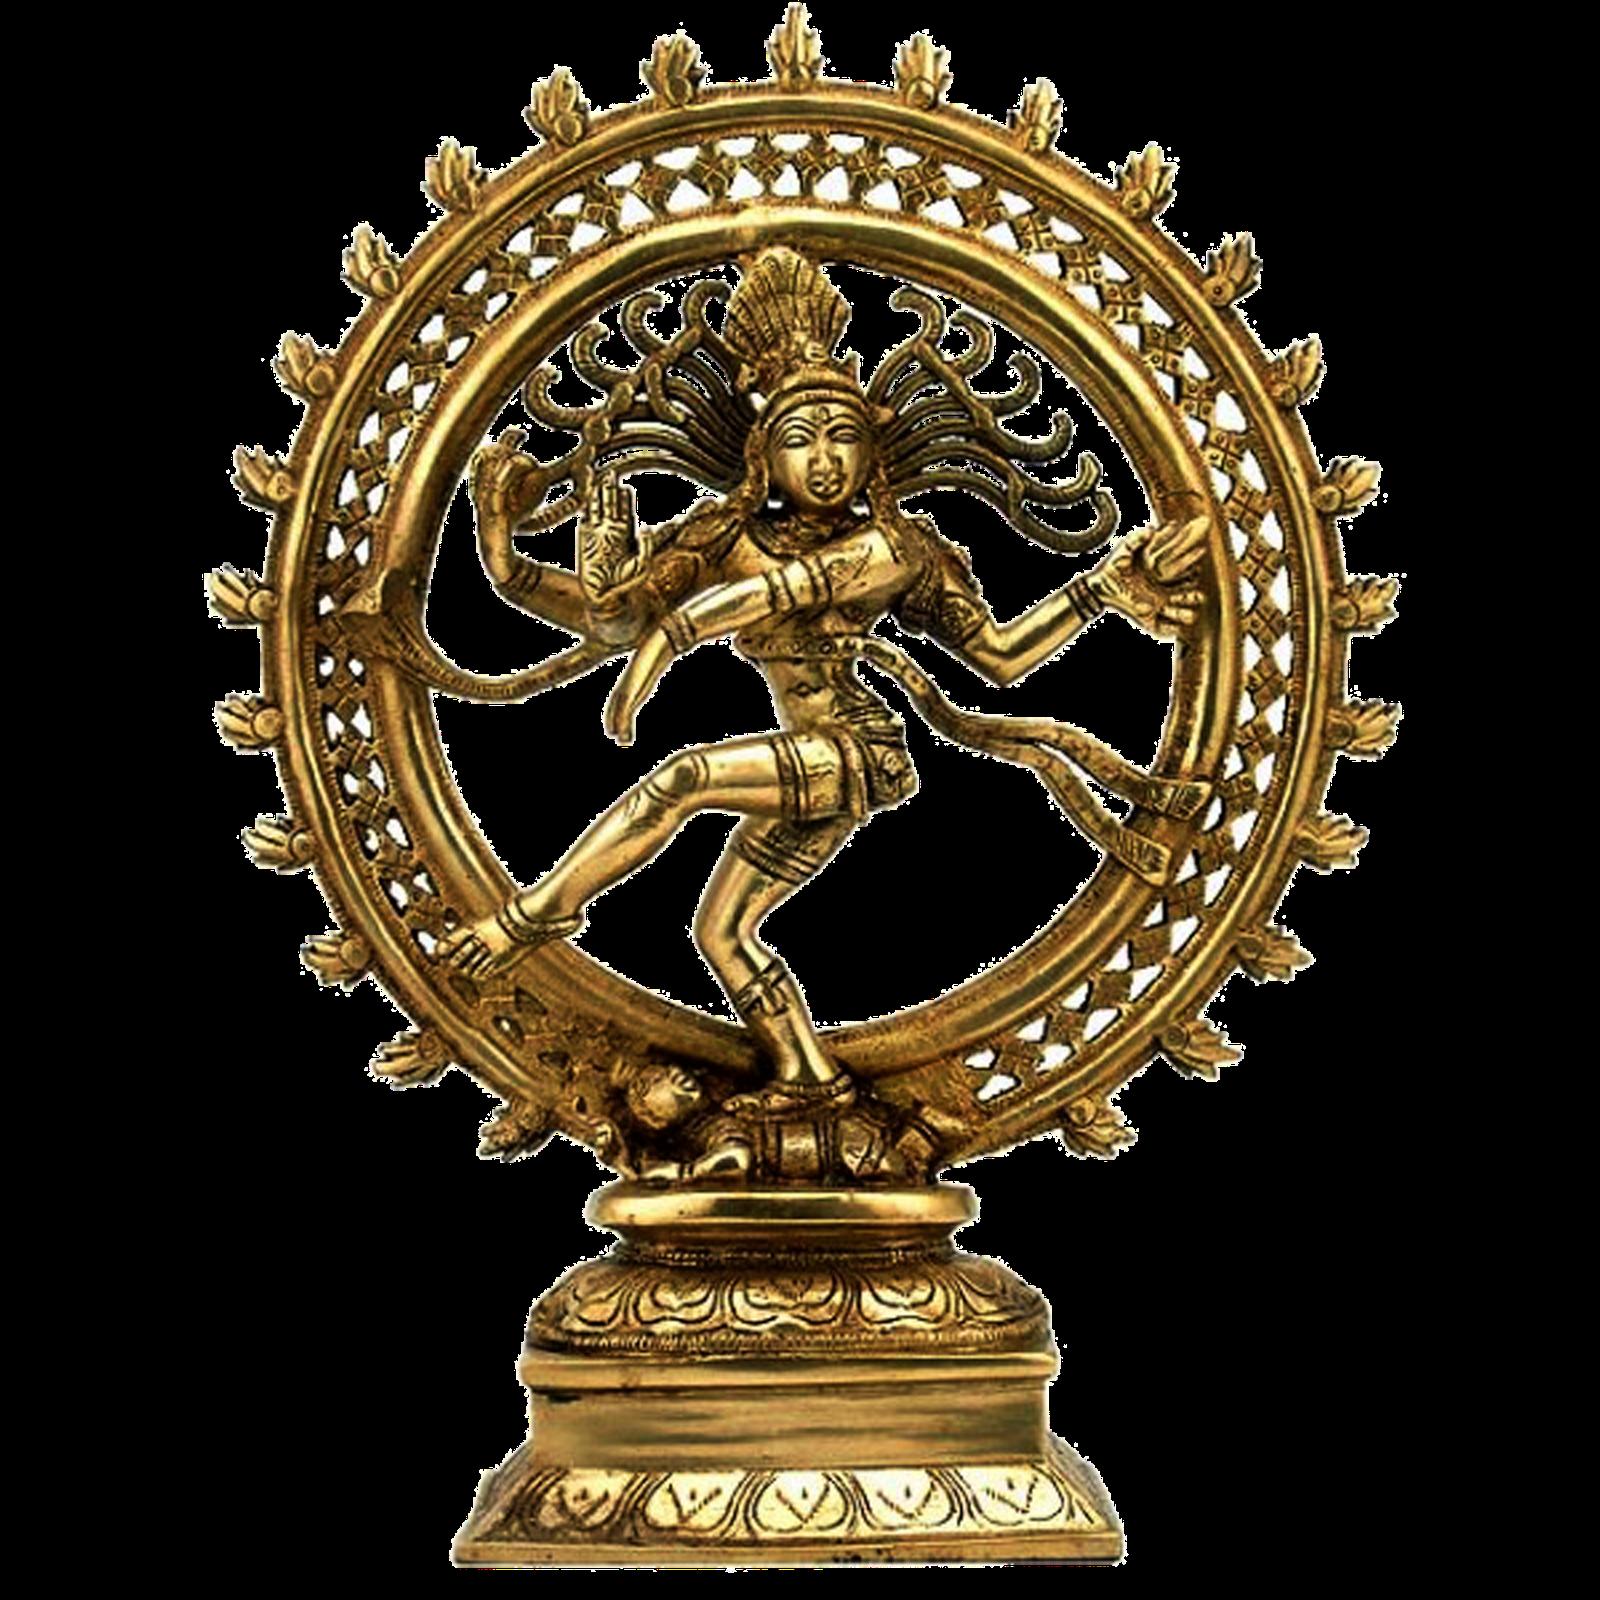 Lord Shiva Lingam Wallpapers 3d Indiaspirituality Nirvana Shatkam Atma Shatkam By Adi